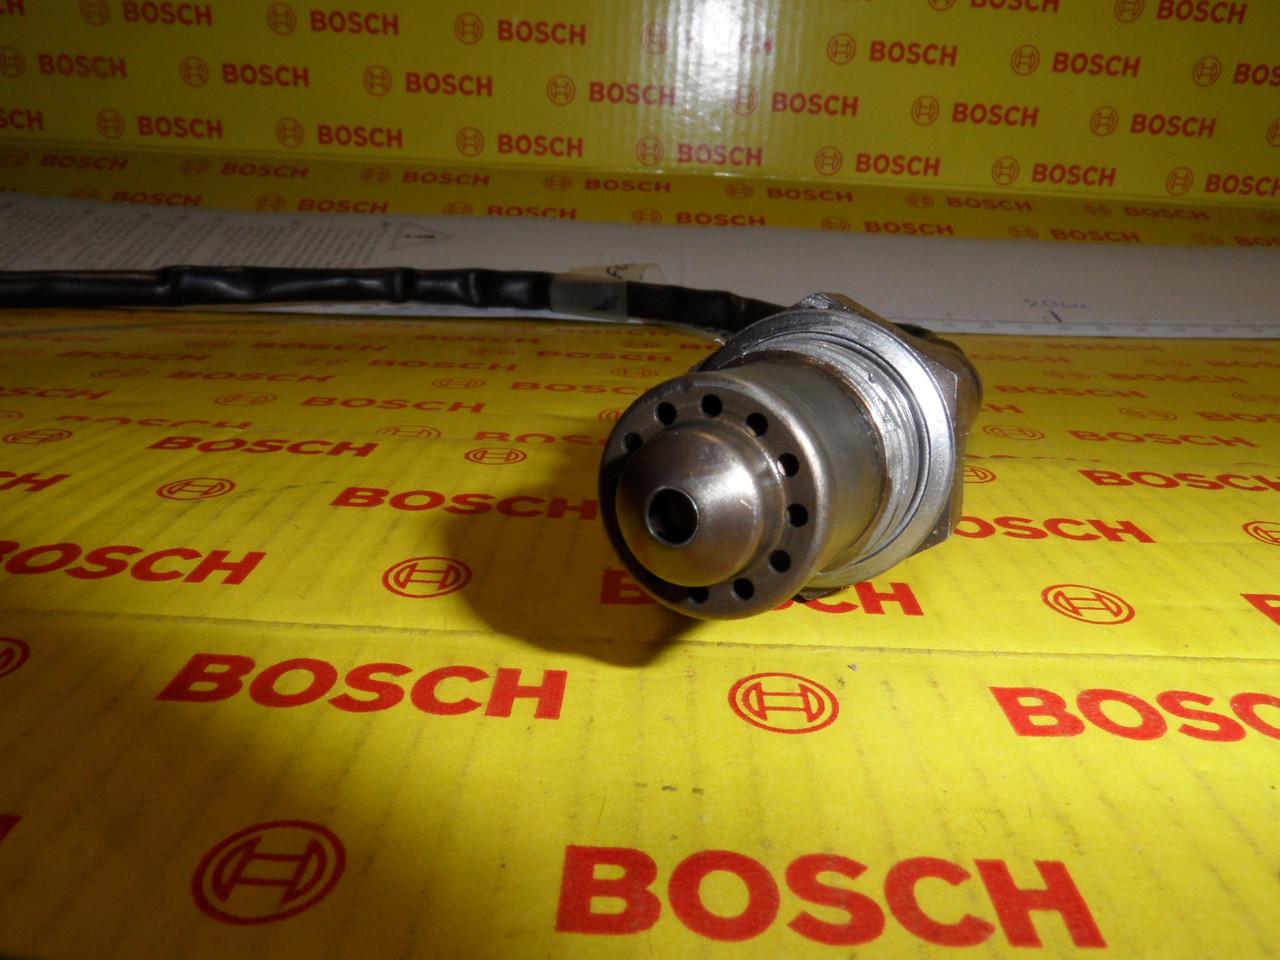 Лямбда-зонды Bosch, 6G91-9F472-AA, 0258006925, 0 258 006 925, оригинал форд